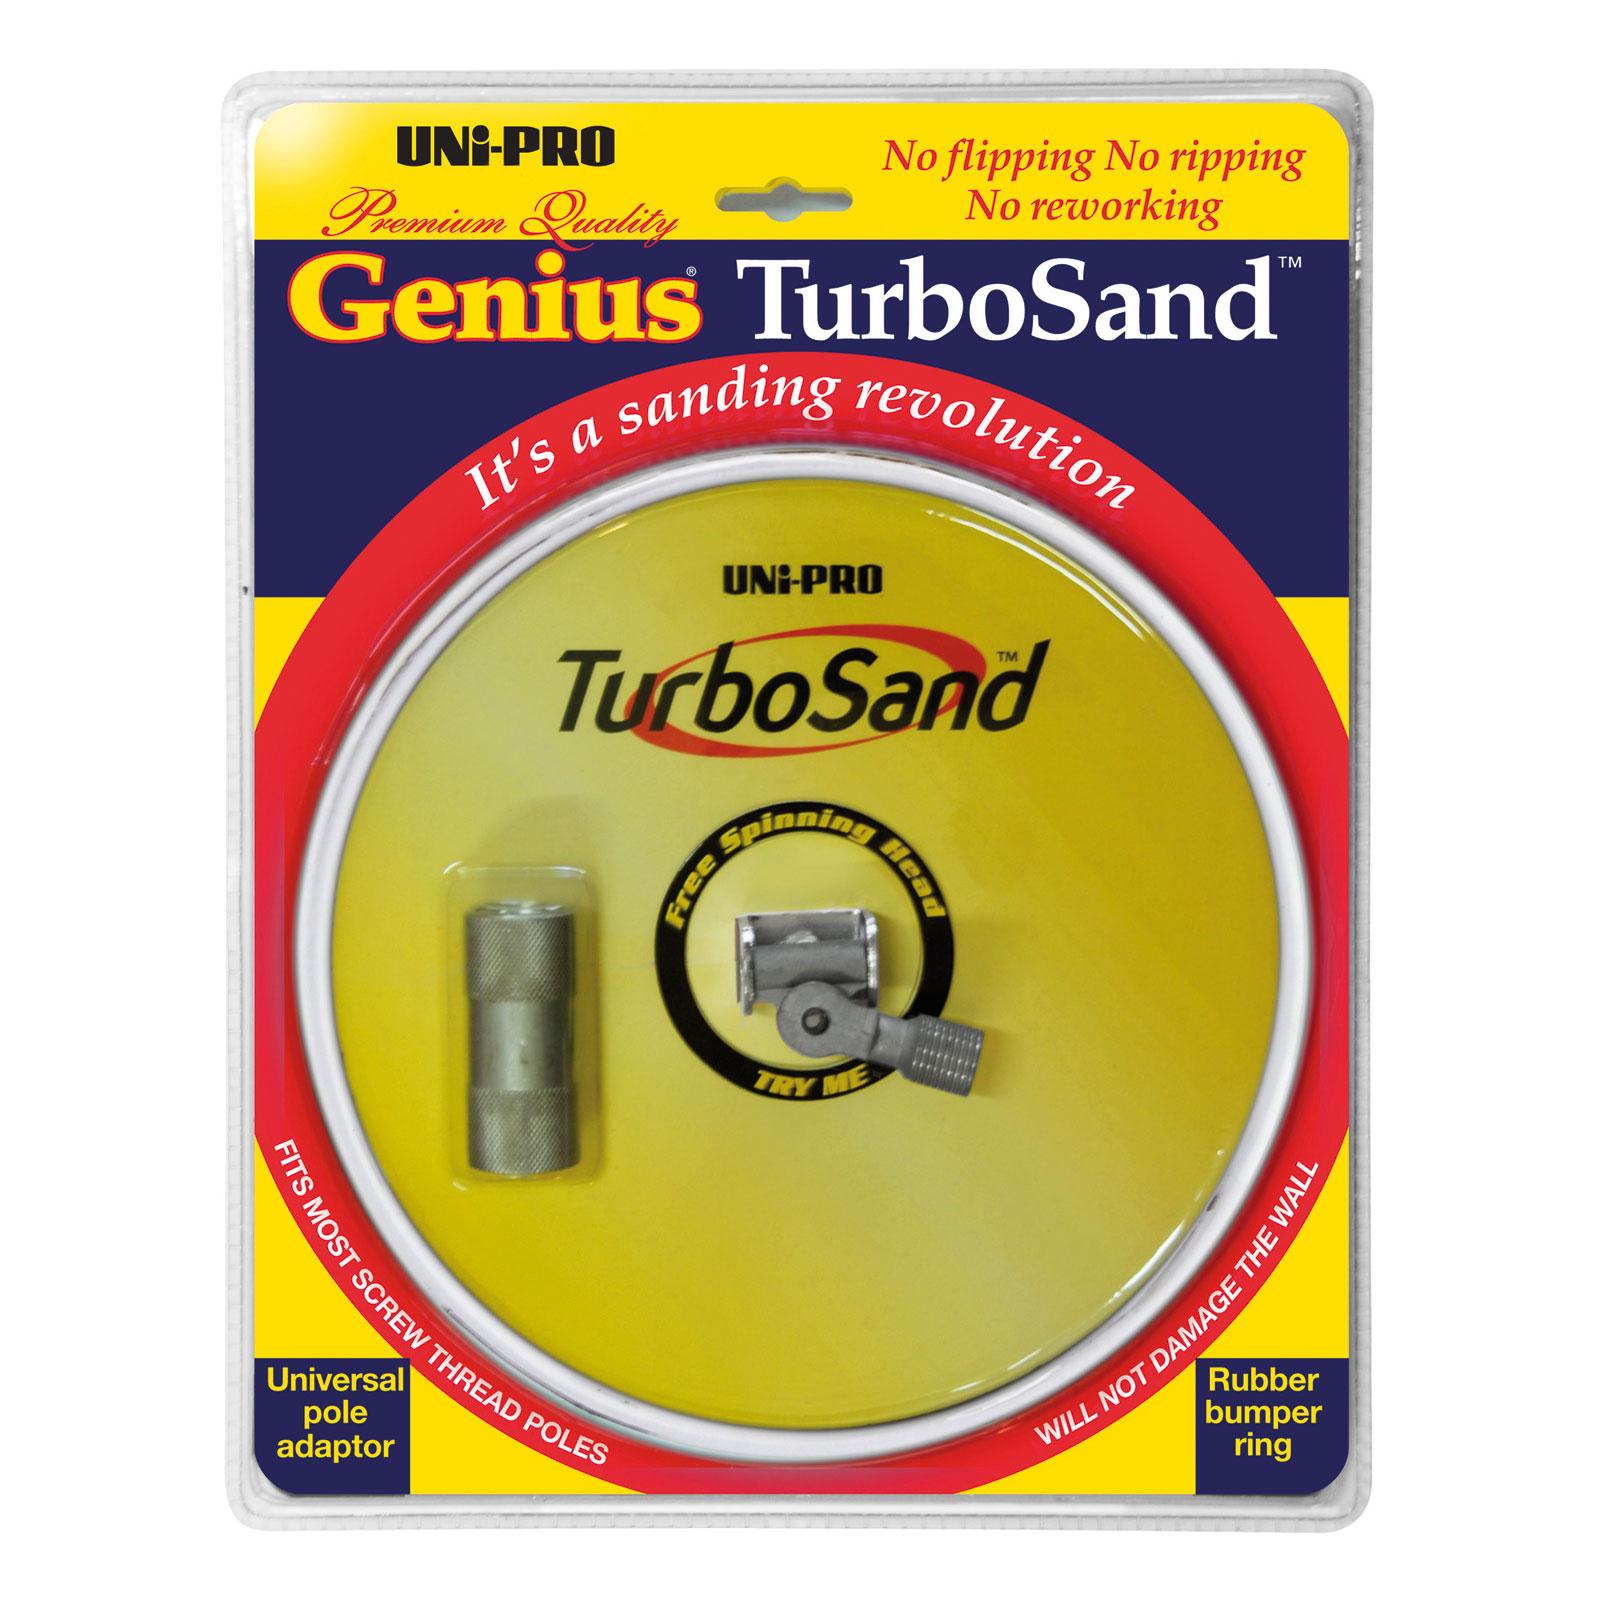 Genius TurboSand Circular Pole Sander